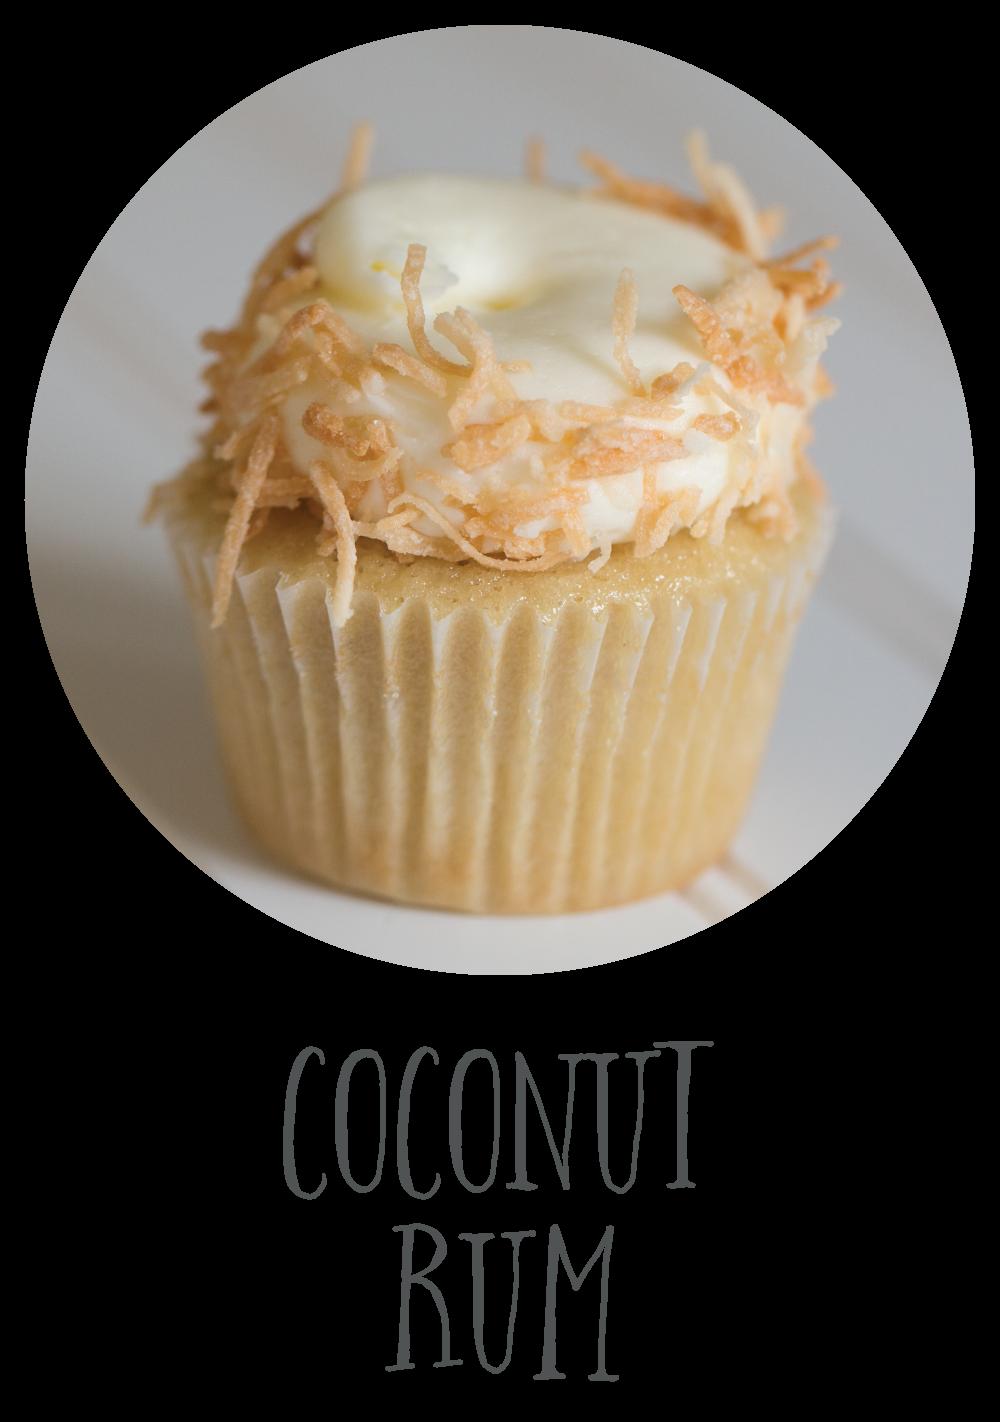 Coconut-Rum.png